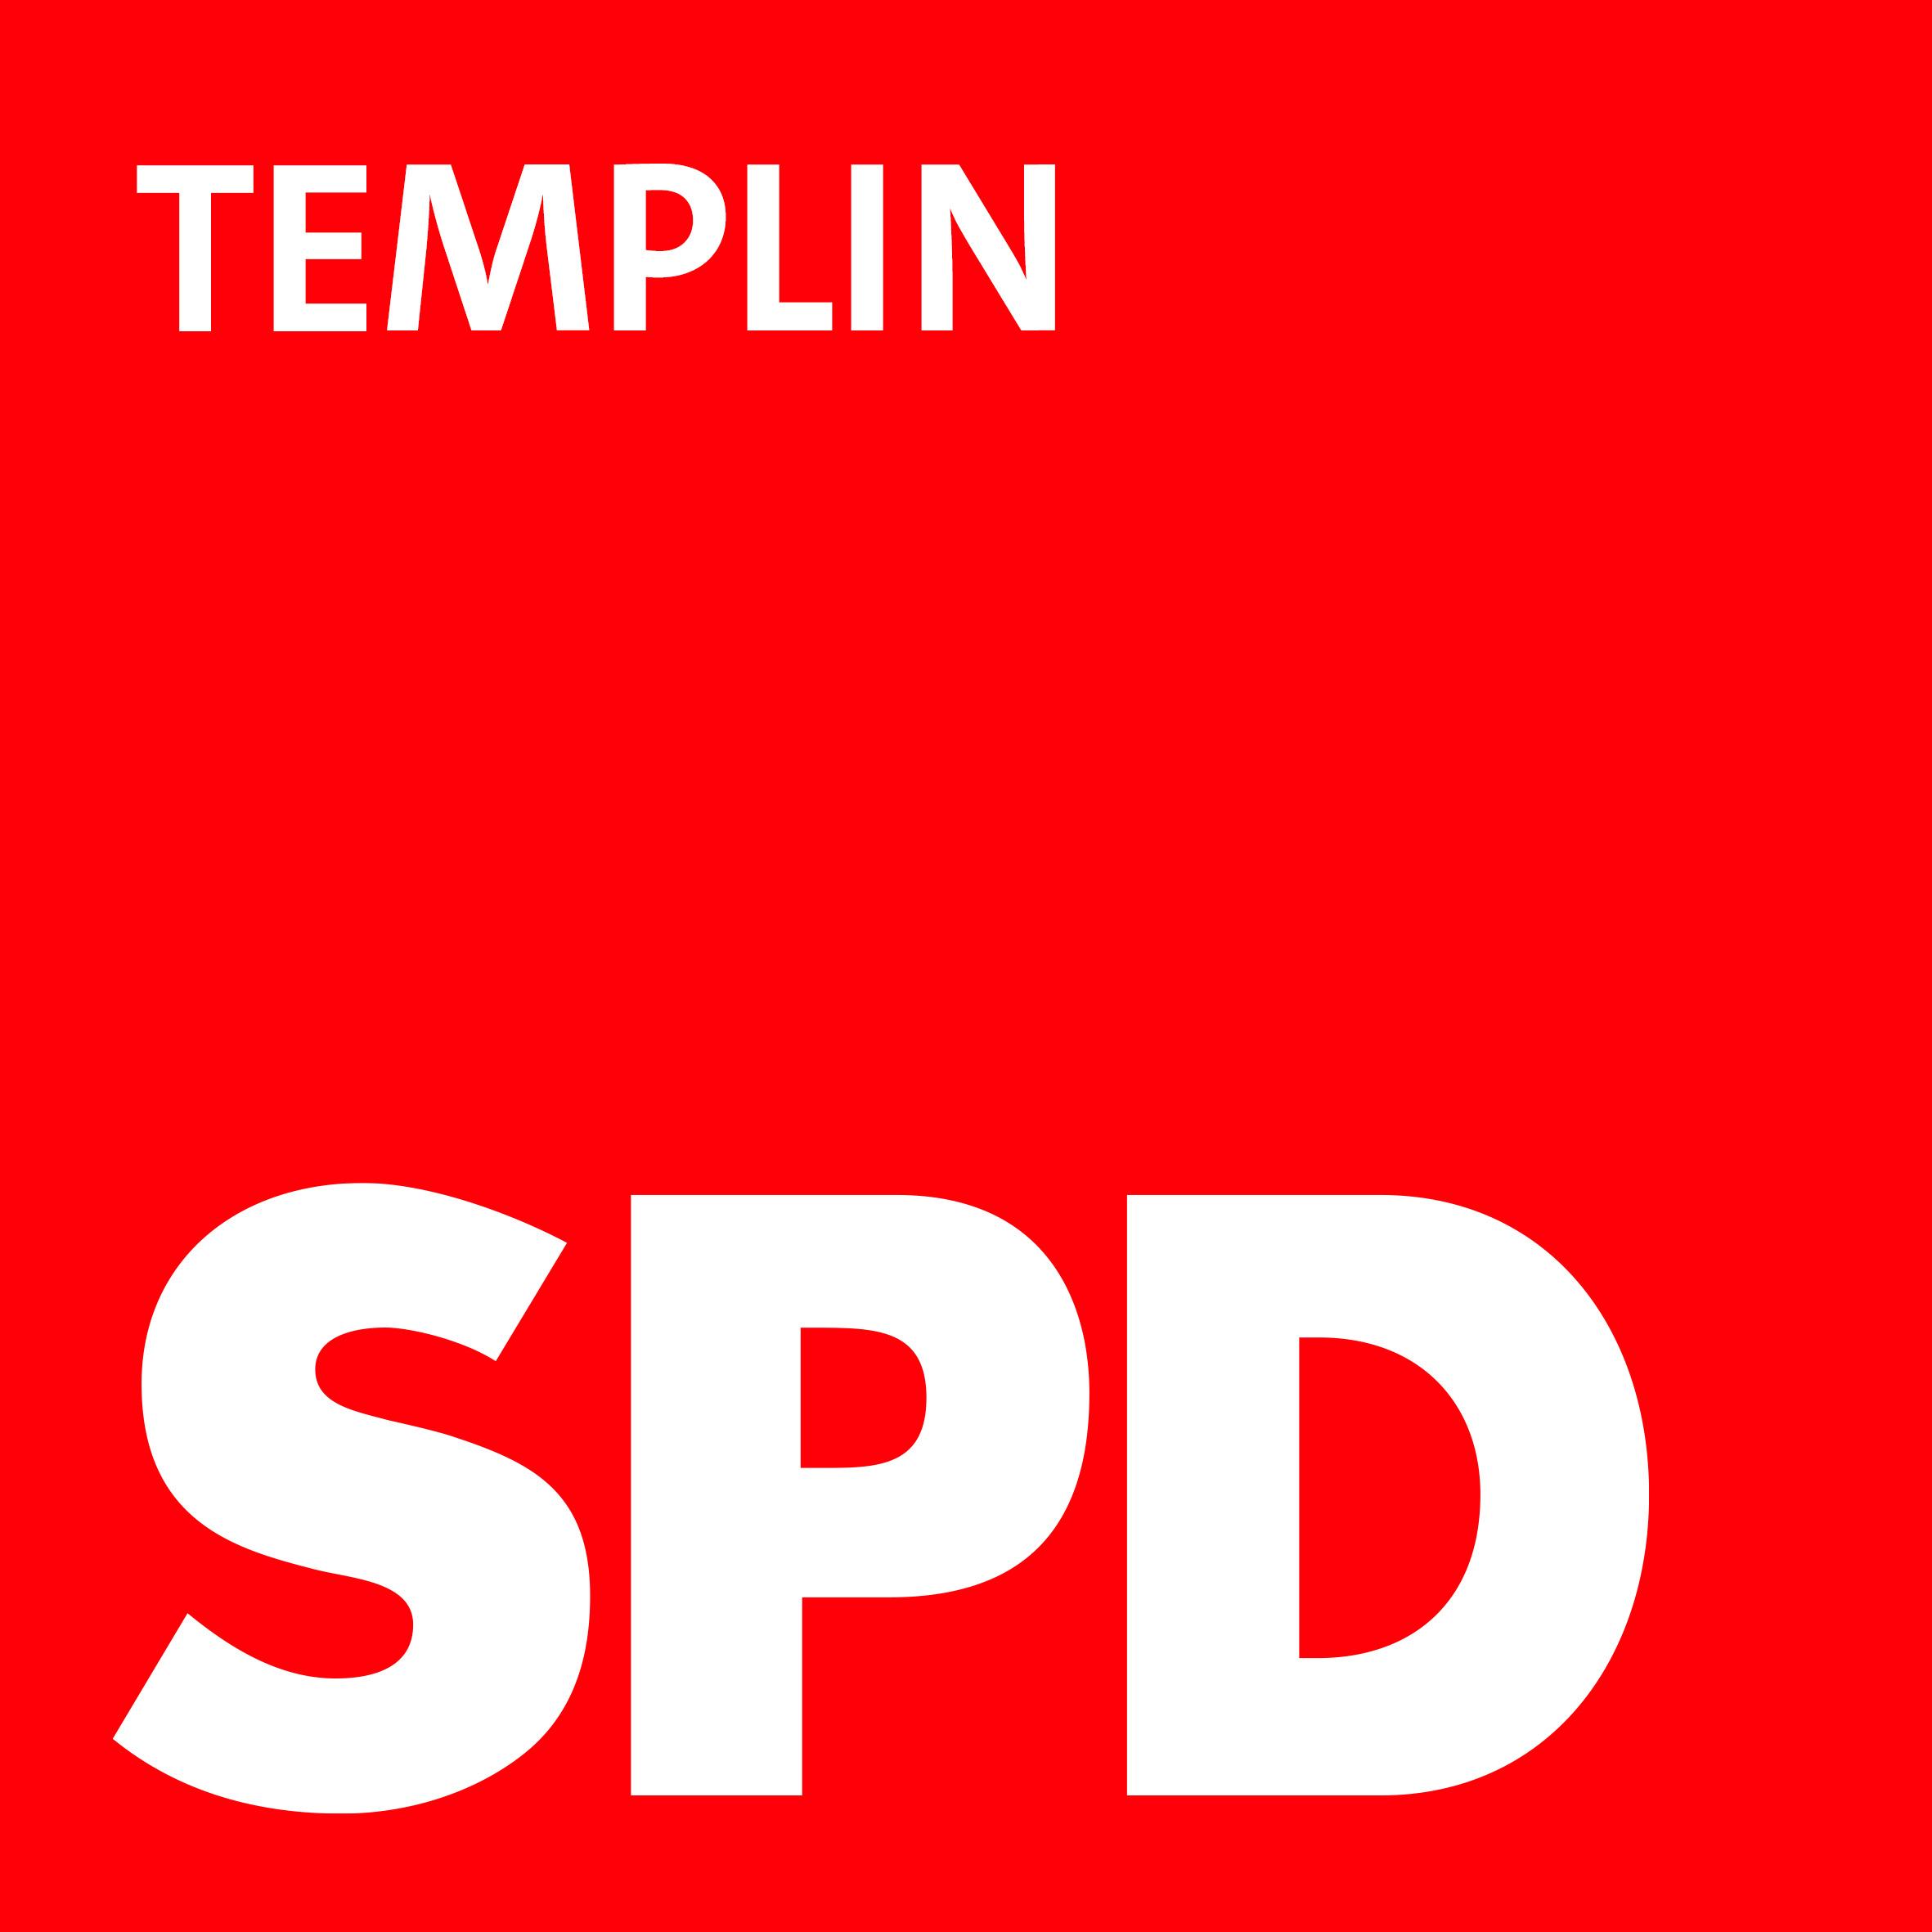 SPD Templin